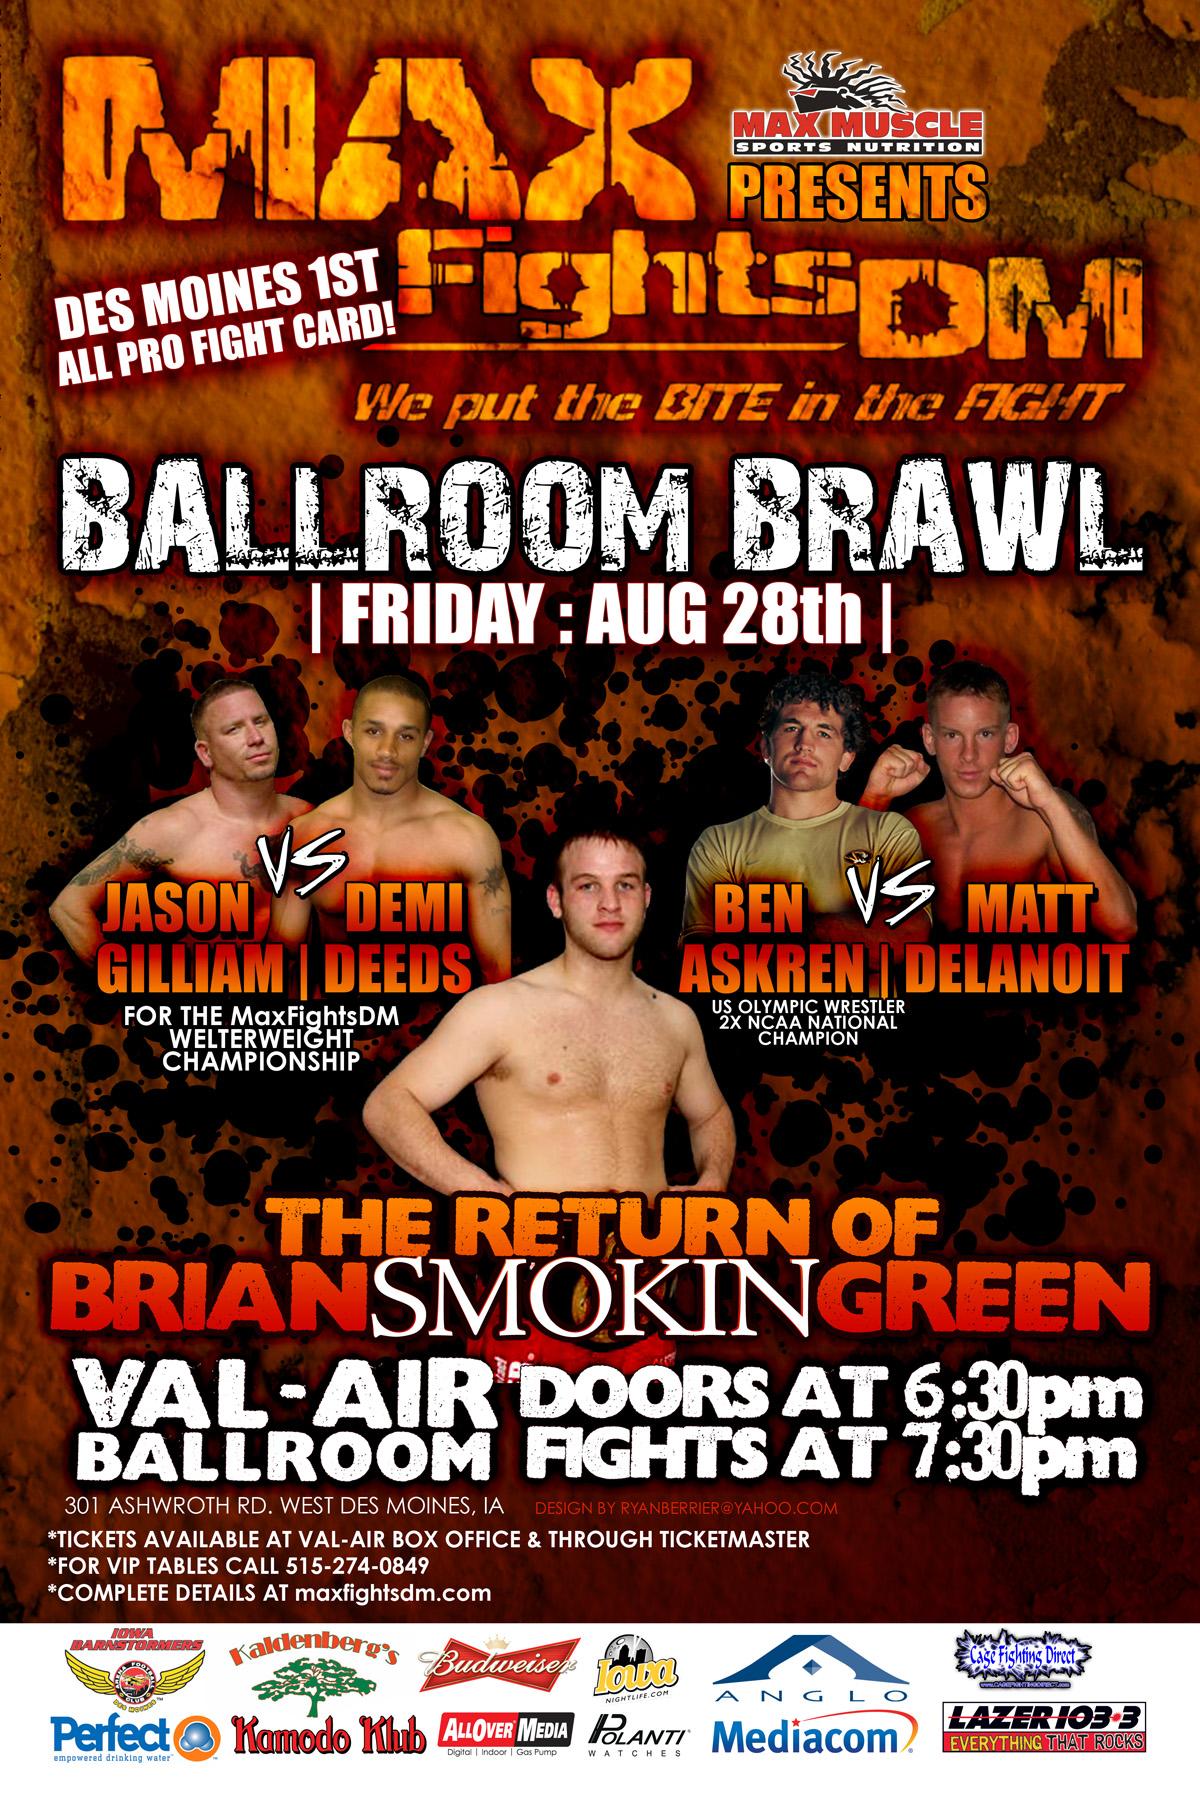 Max Fights DM Ballroom Brawl - Promo